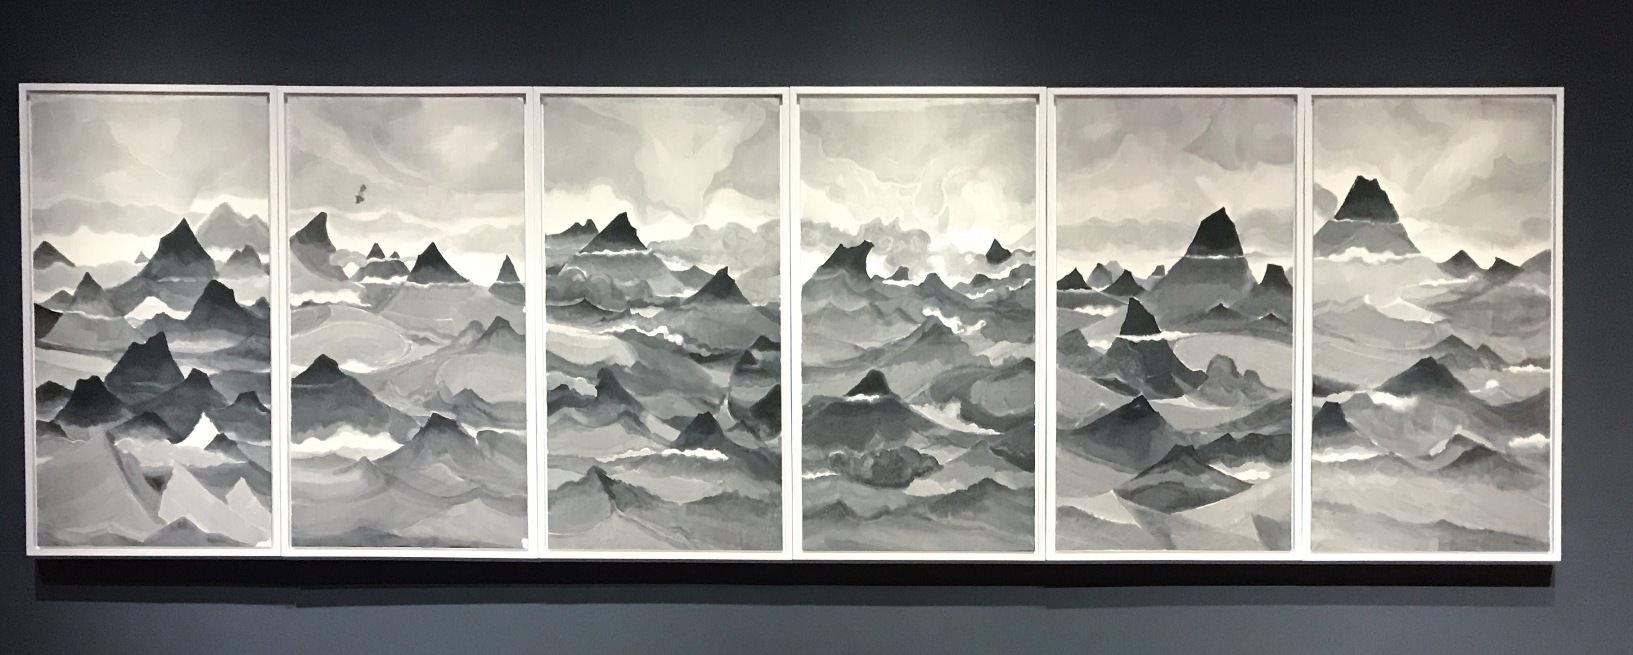 Tang Nannan, Oblivious ocean 7